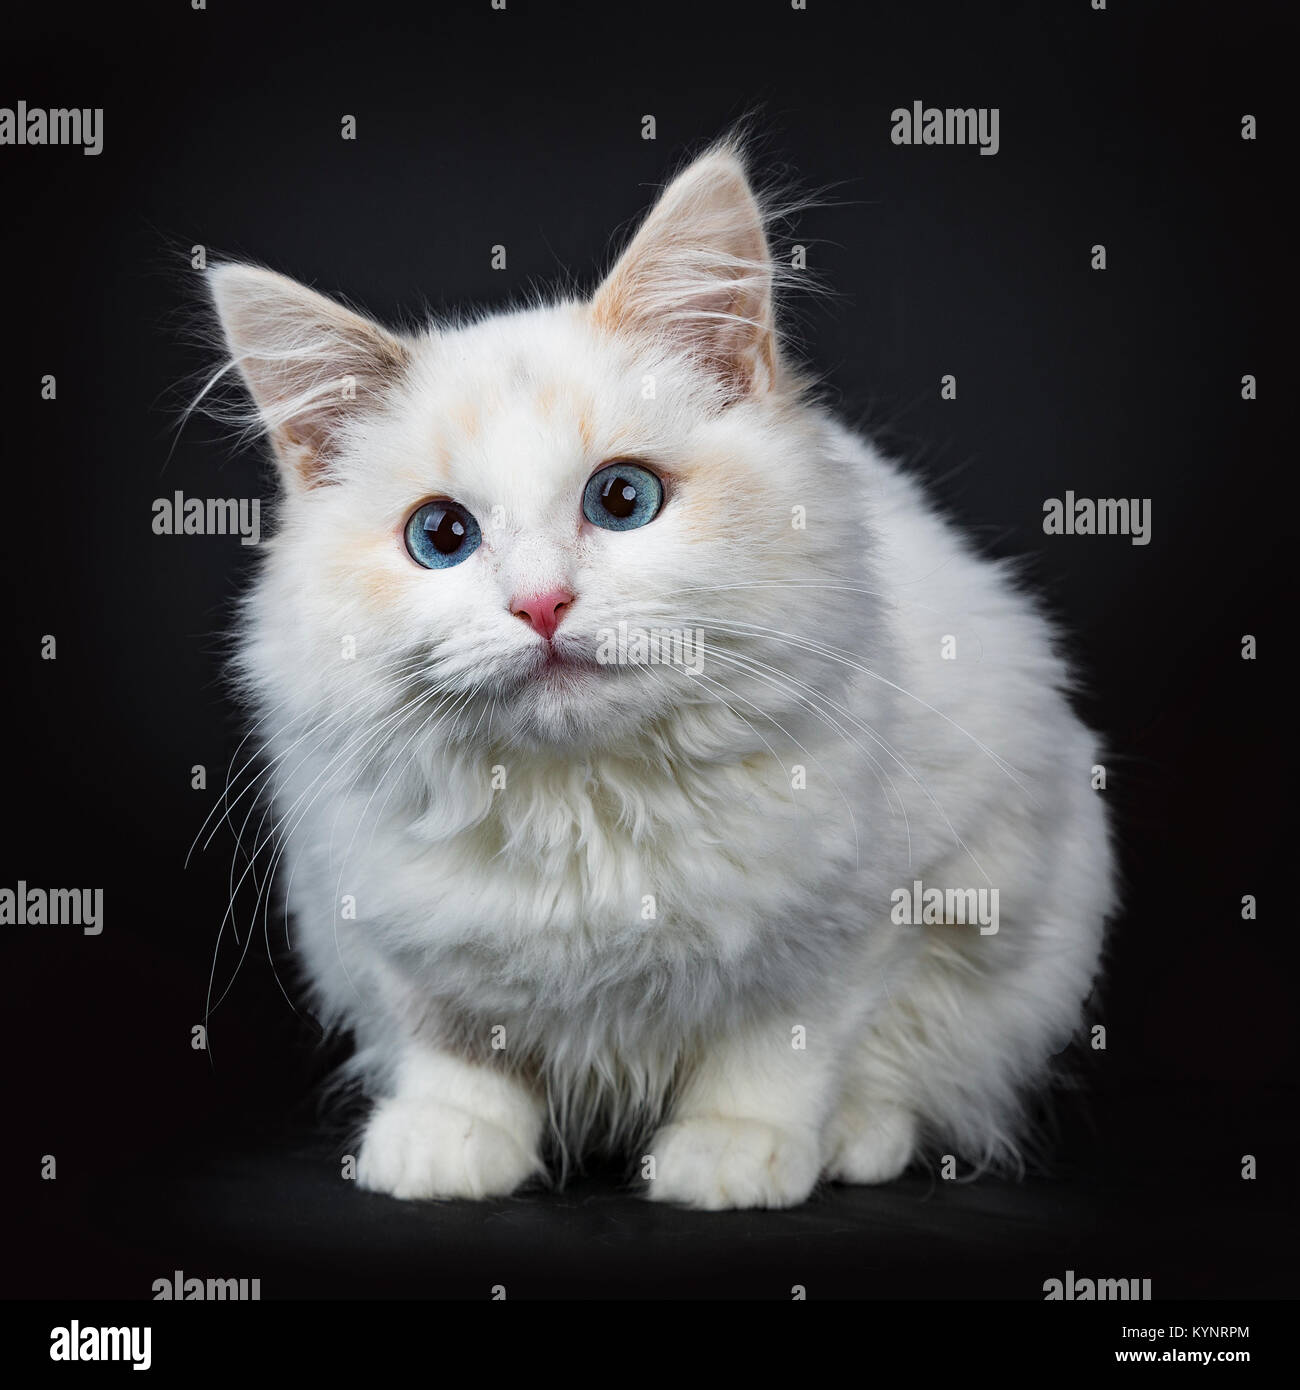 Blue eyed ragdoll cat / kitten laying isolated on black background facing camera waiting - Stock Image